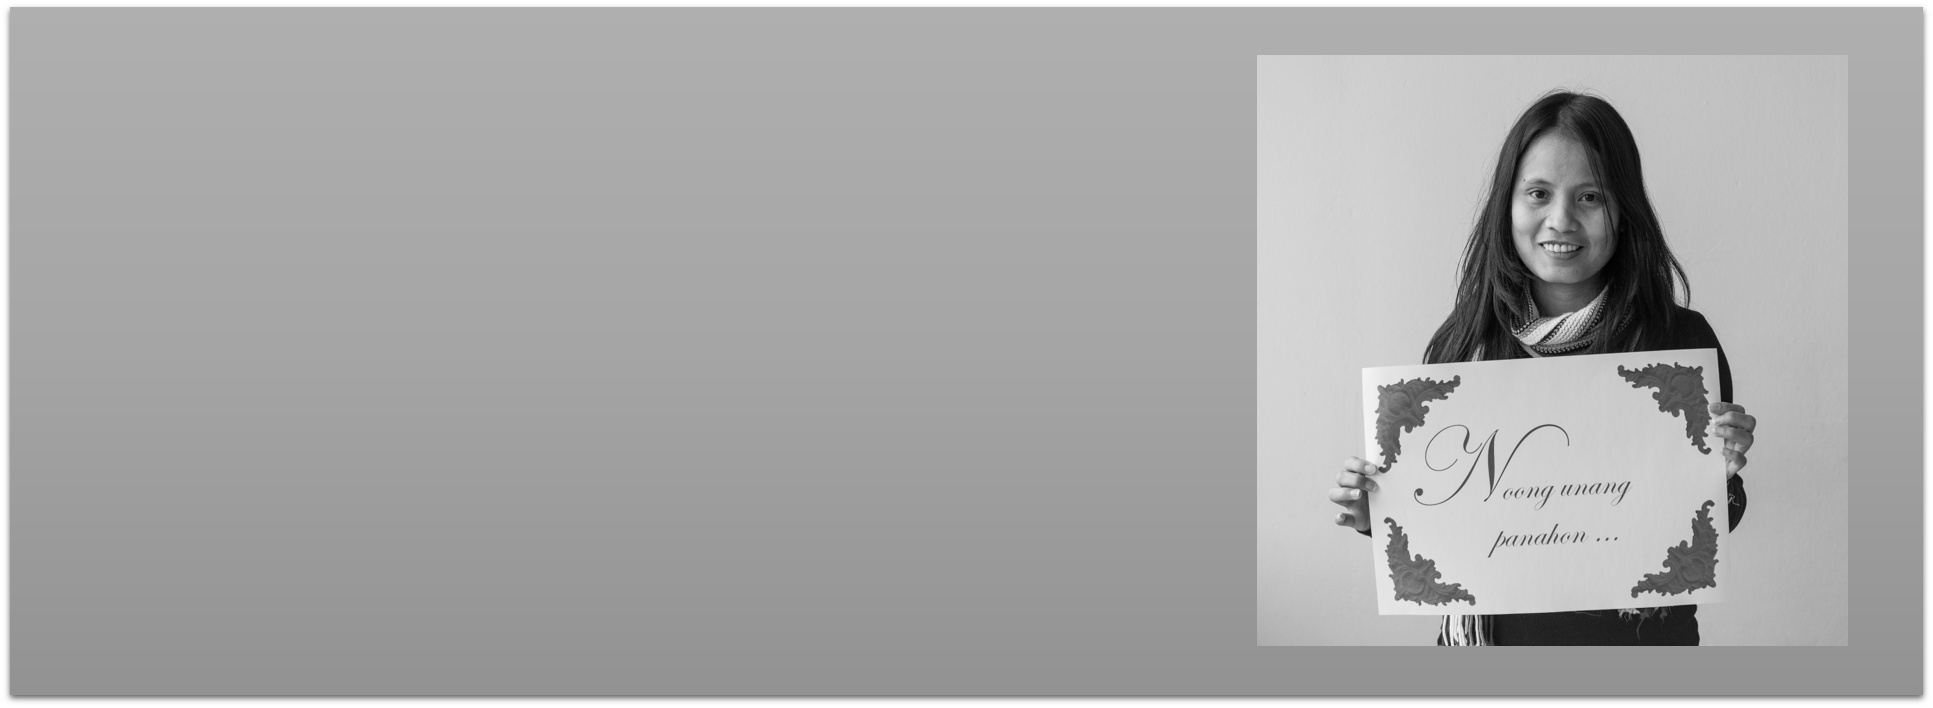 Debbs banner